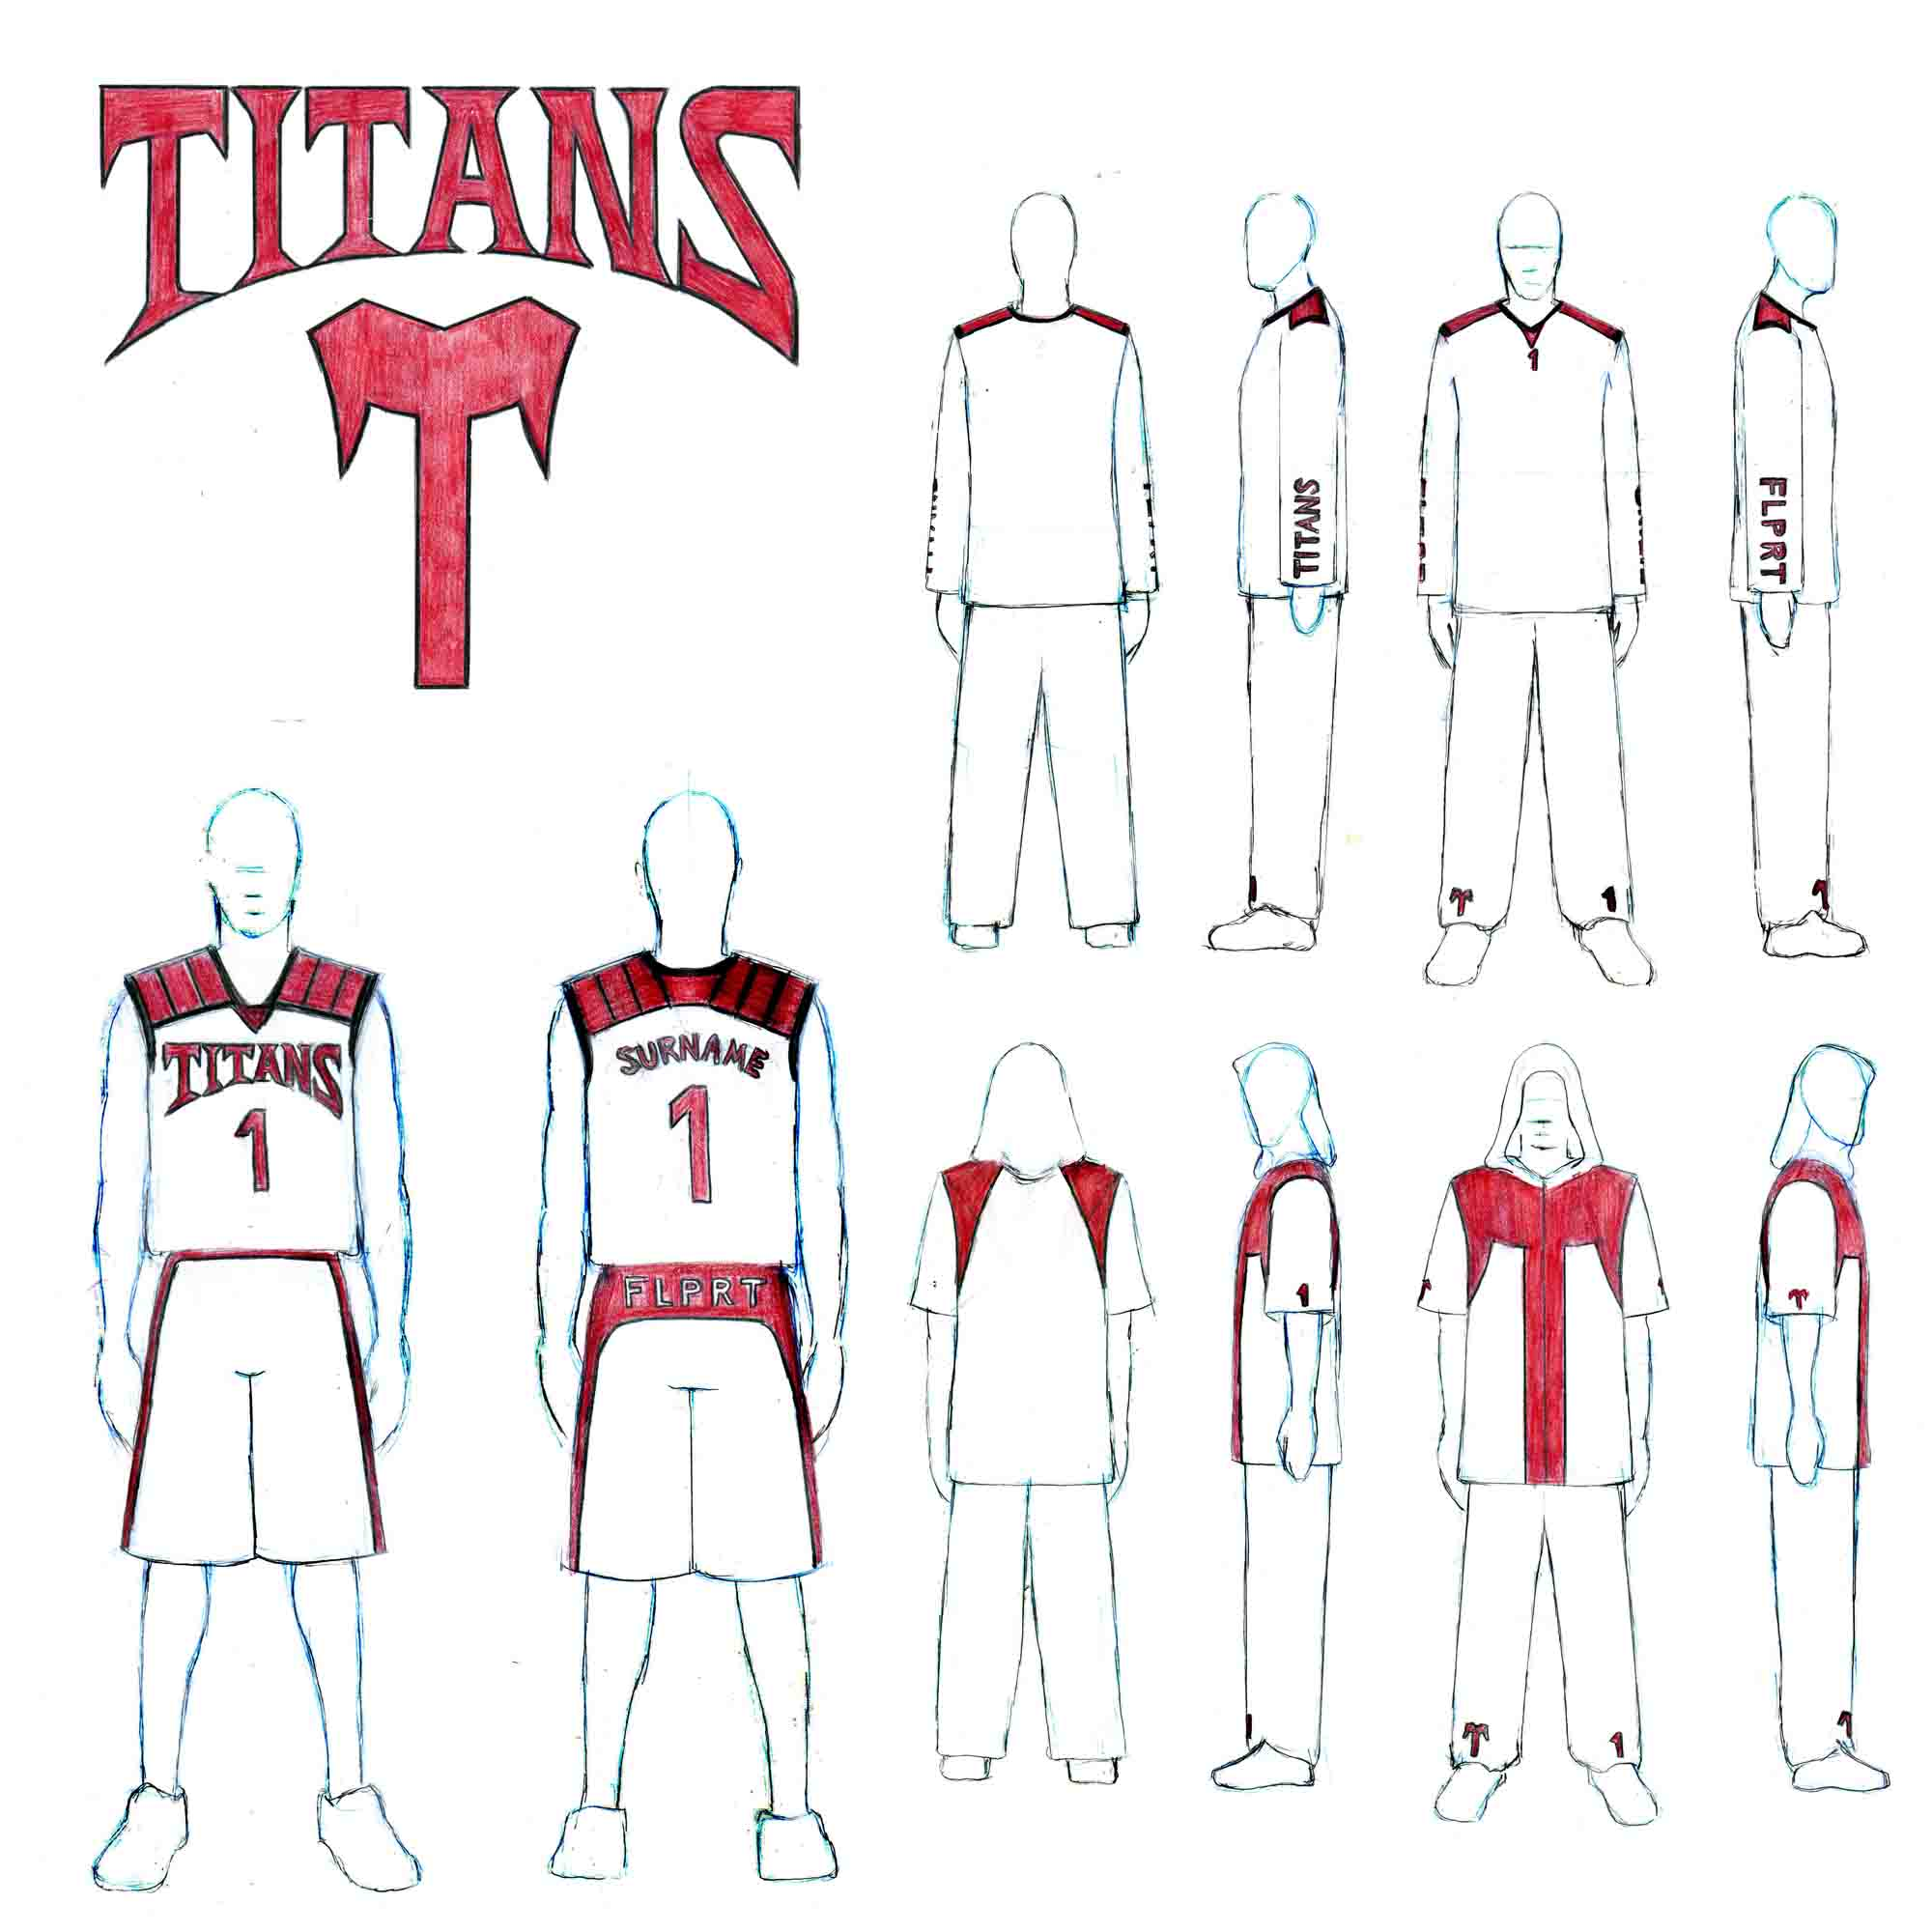 Titans basketball team - logo/apparell design